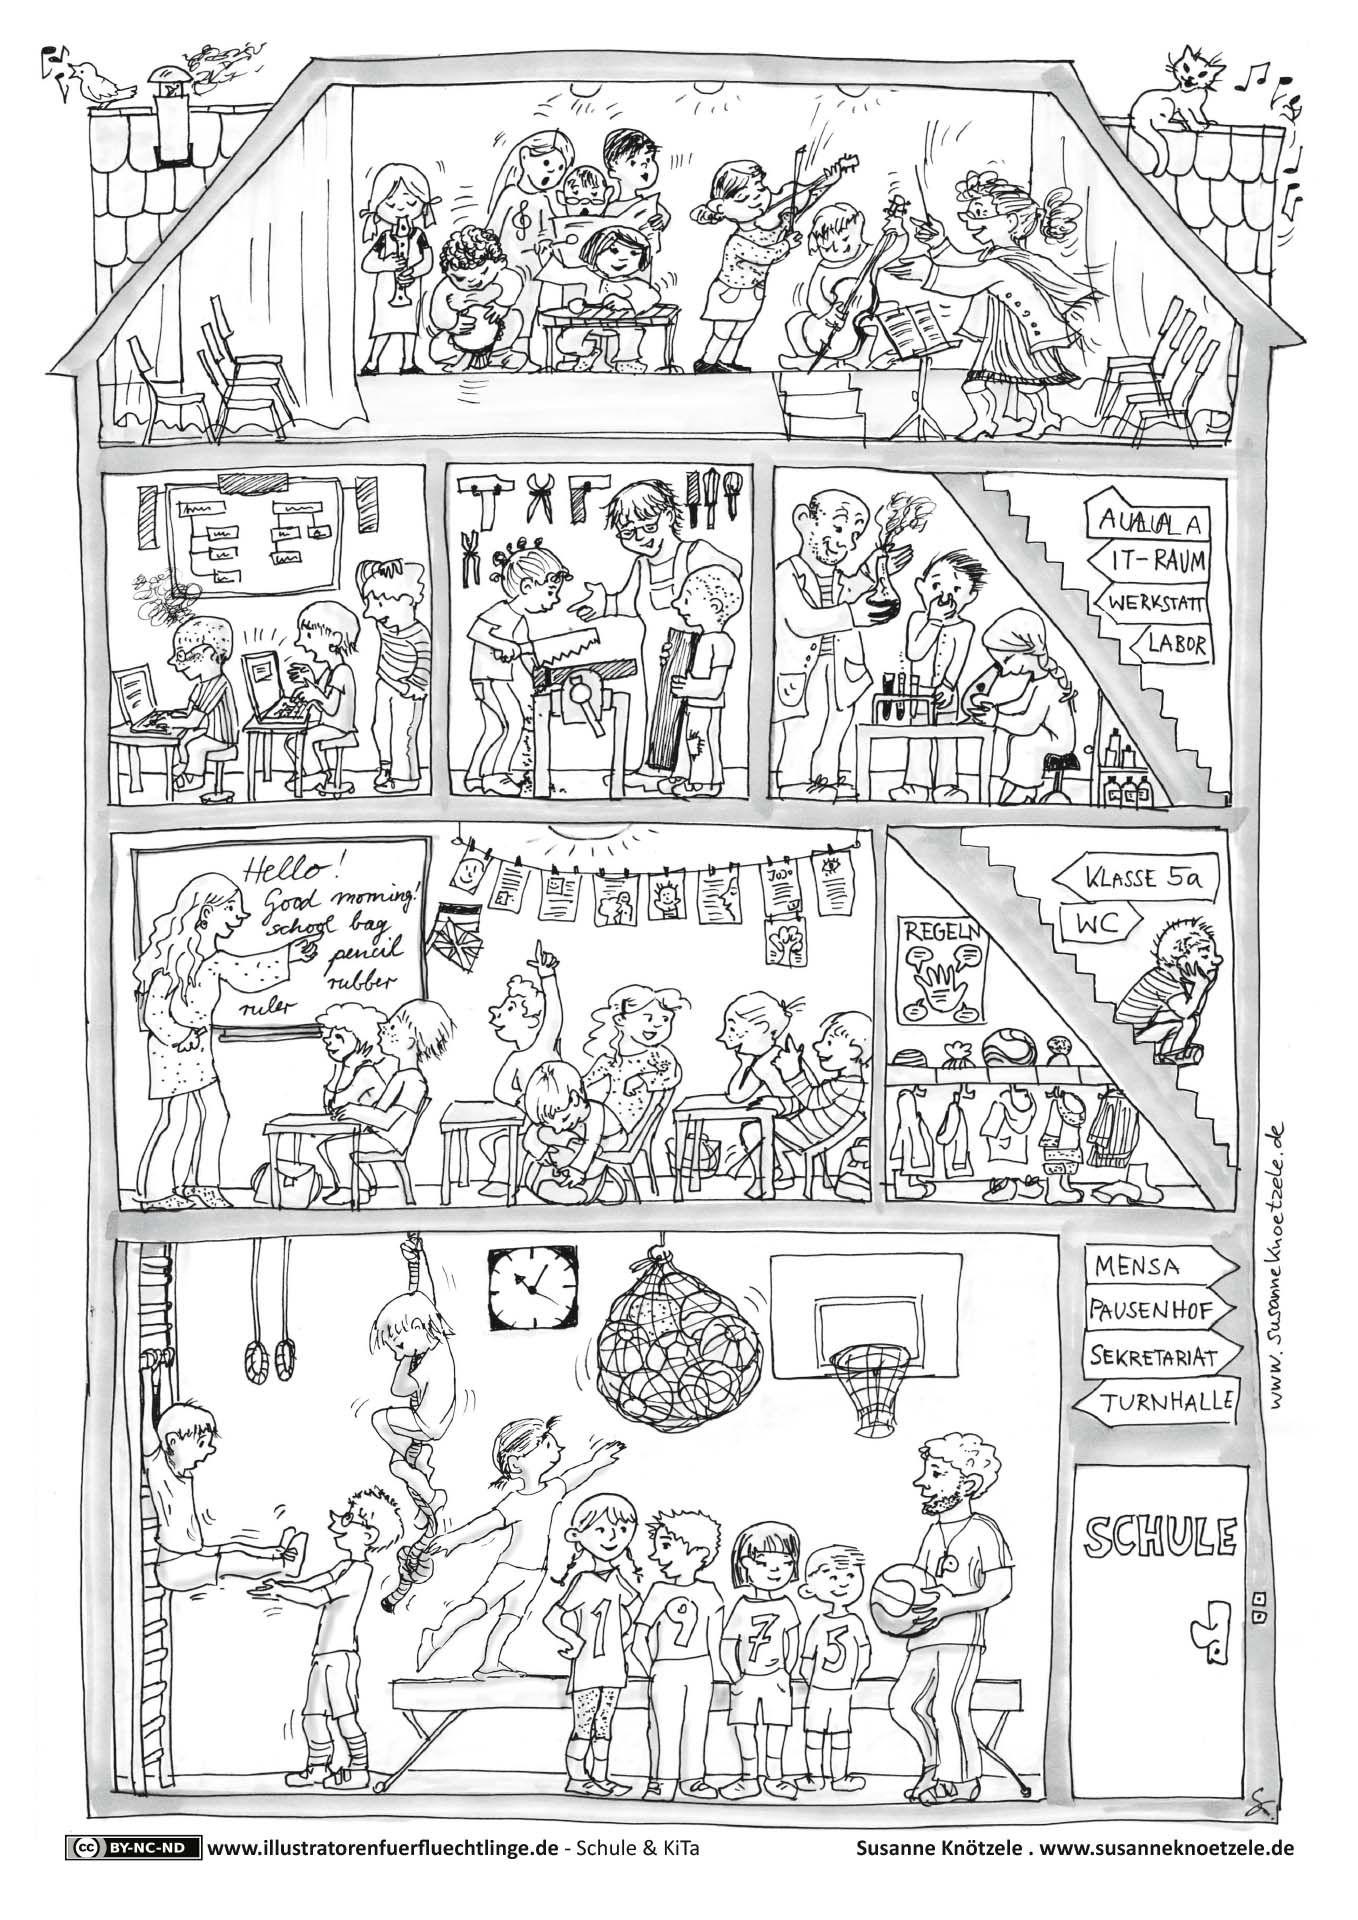 Schule und KiTa - Schule - Knötzele | Ausmalbilder | Pinterest ...